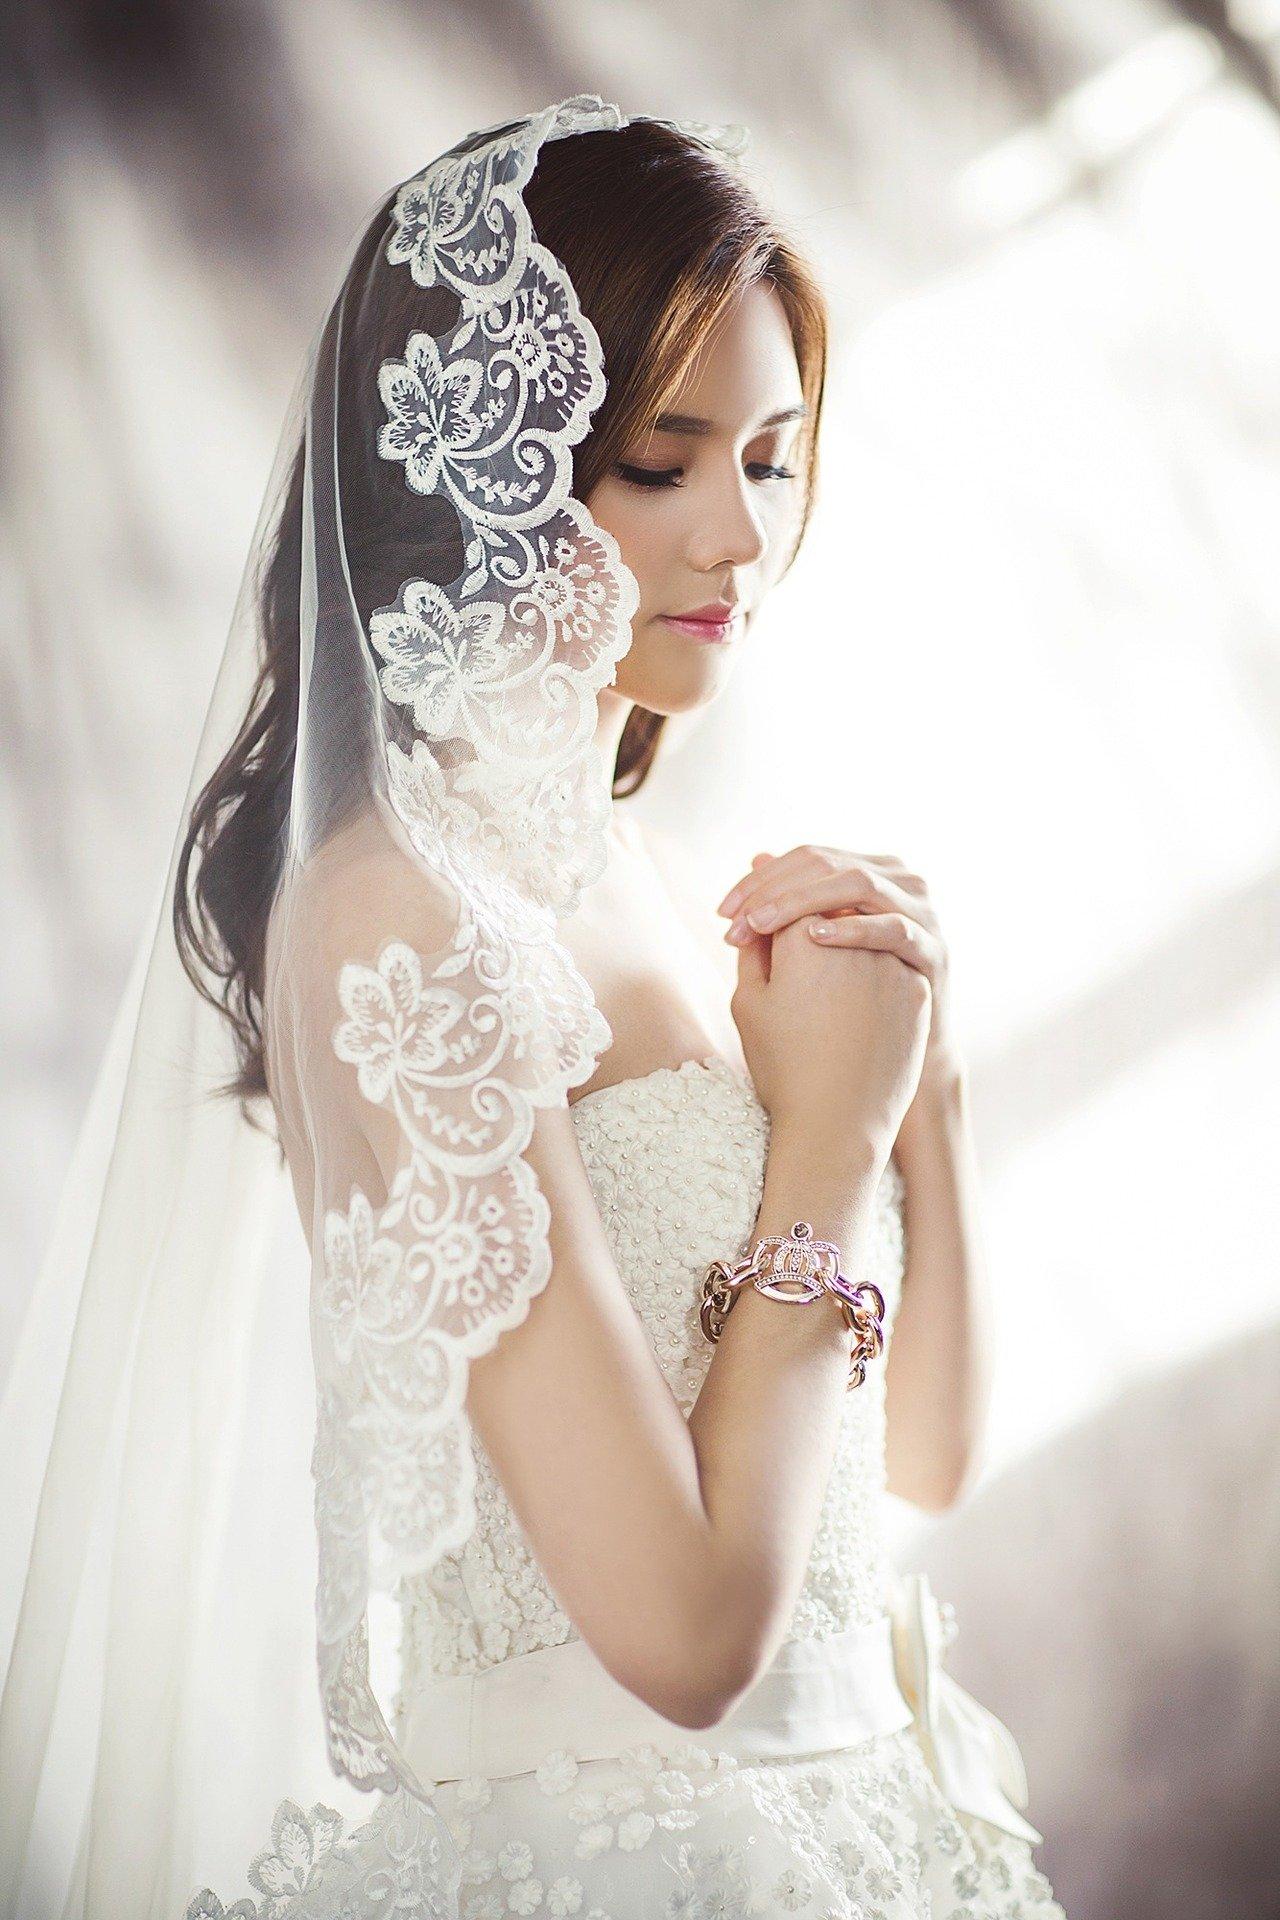 wedding-dresses-g1fea105c6_1920